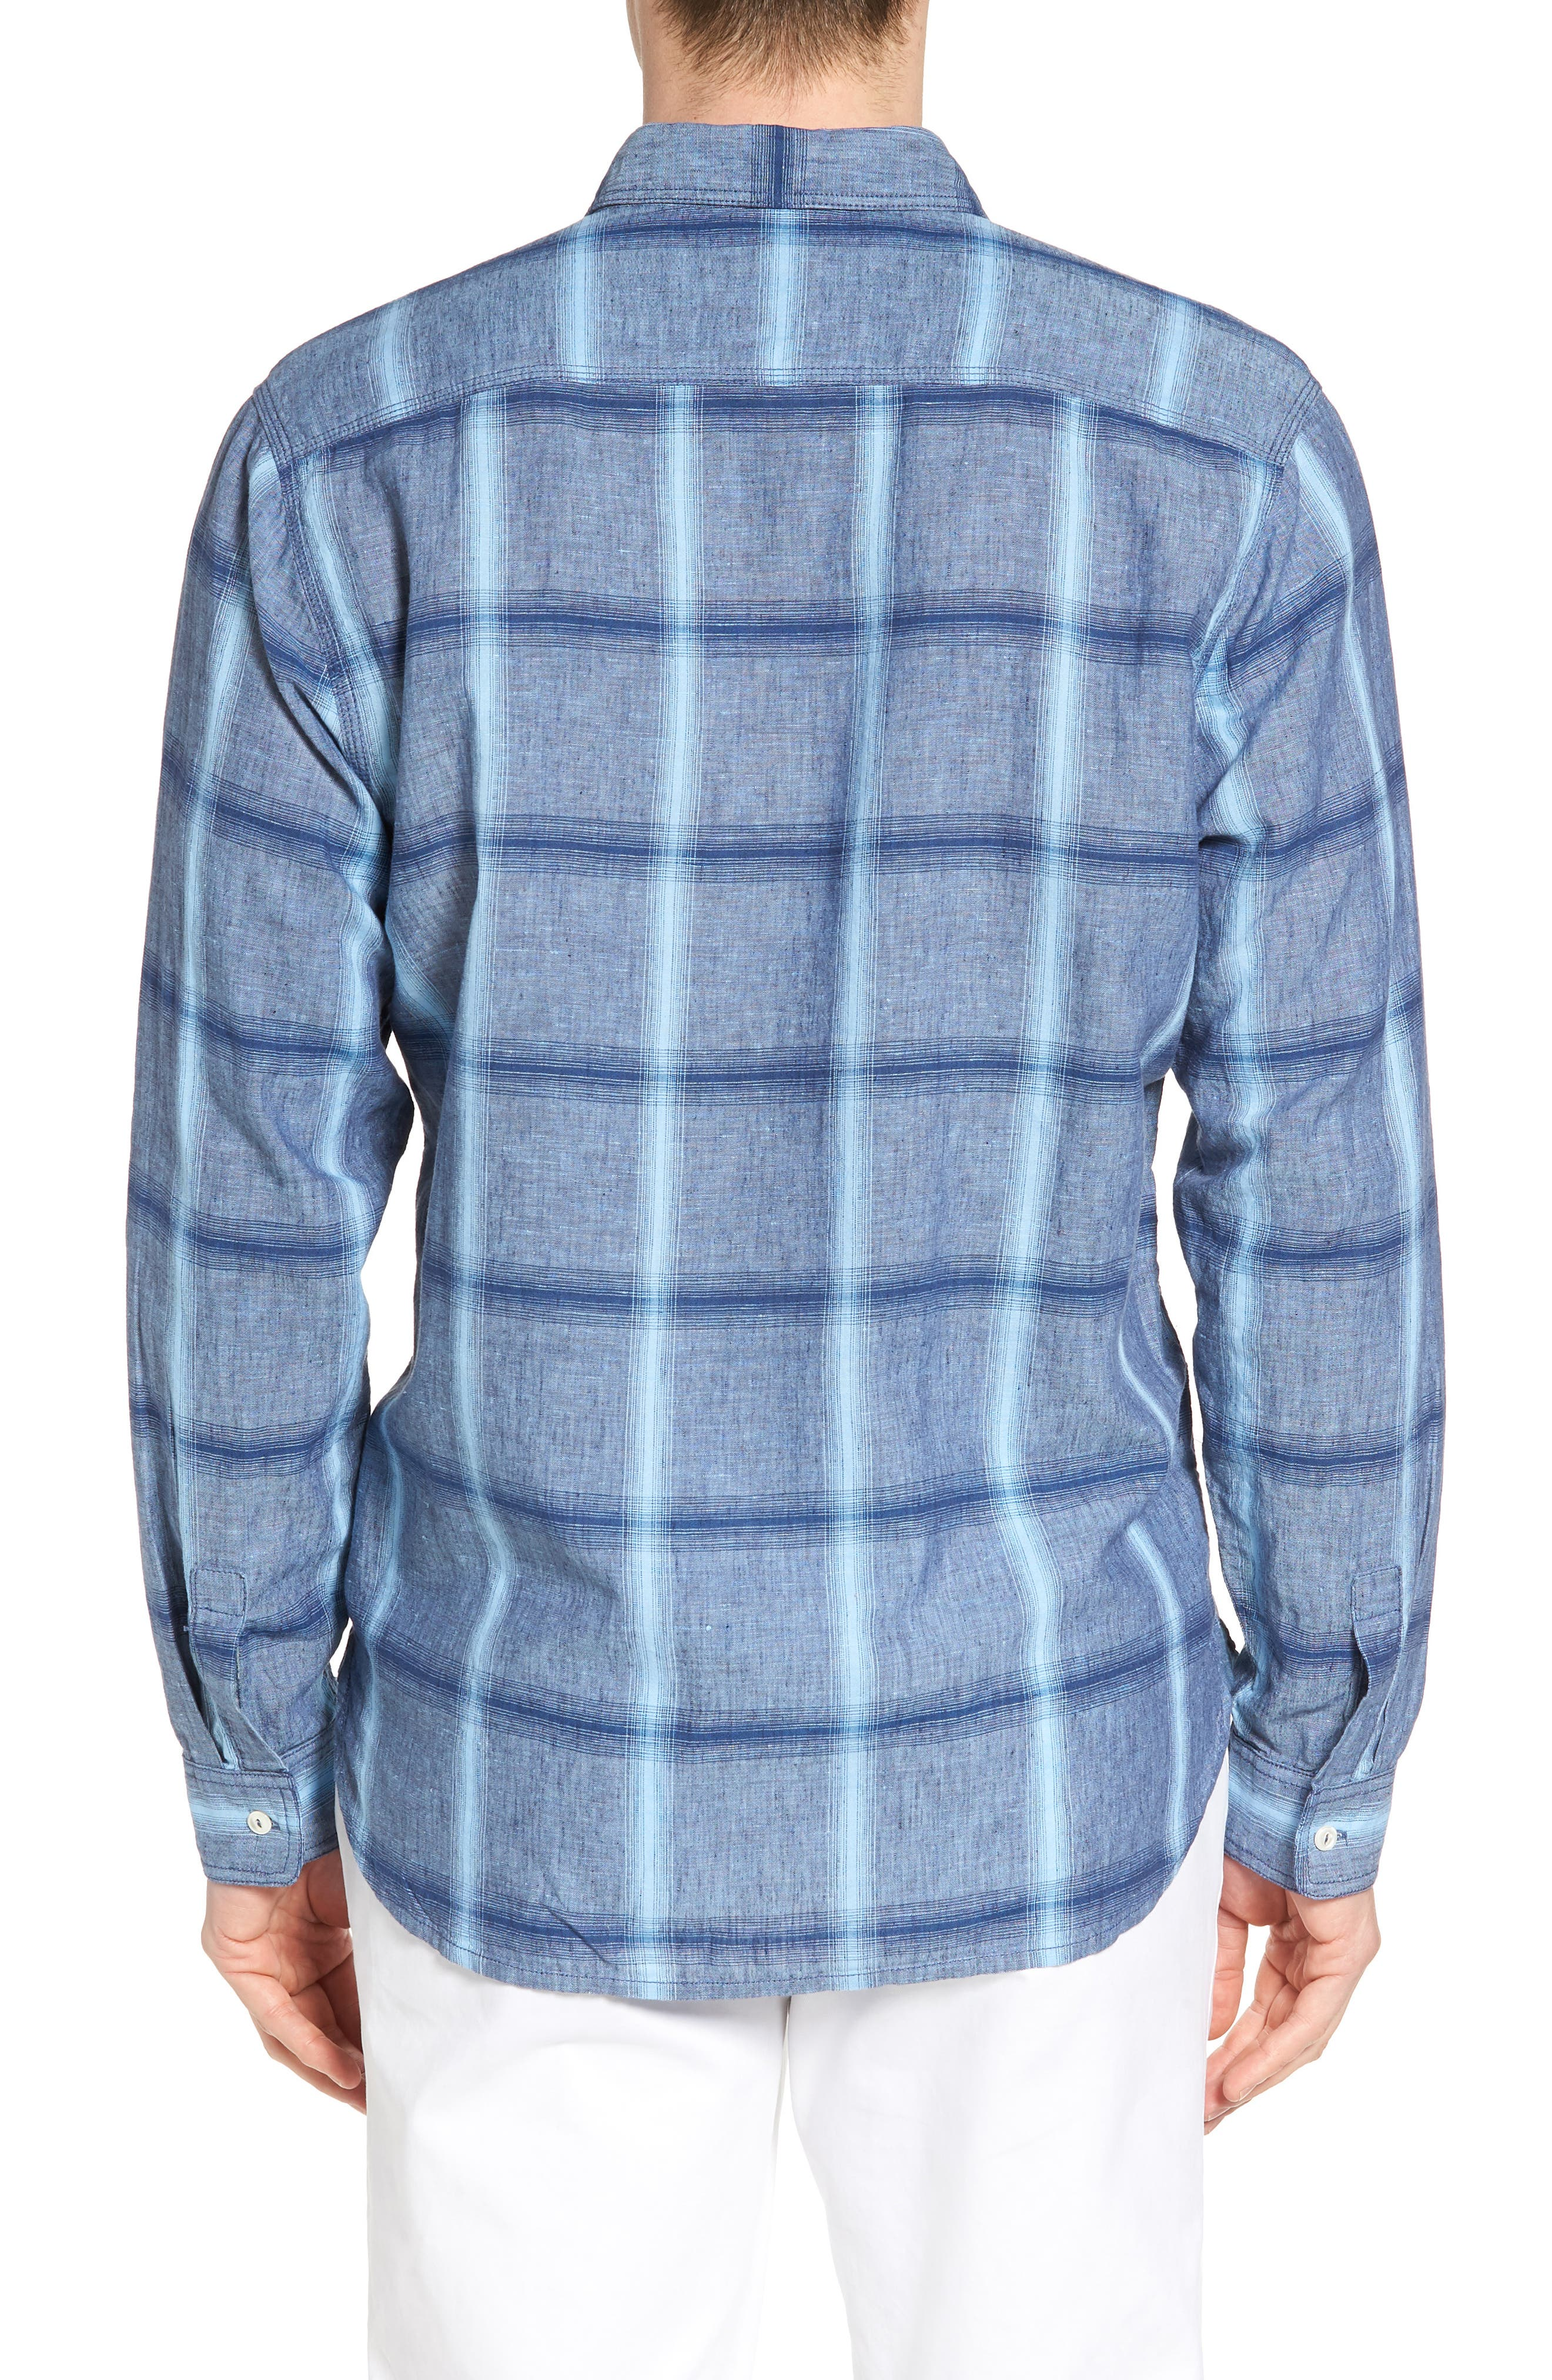 Alternate Image 2  - True Grit Rincon Plaid Linen Blend Chambray Sport Shirt